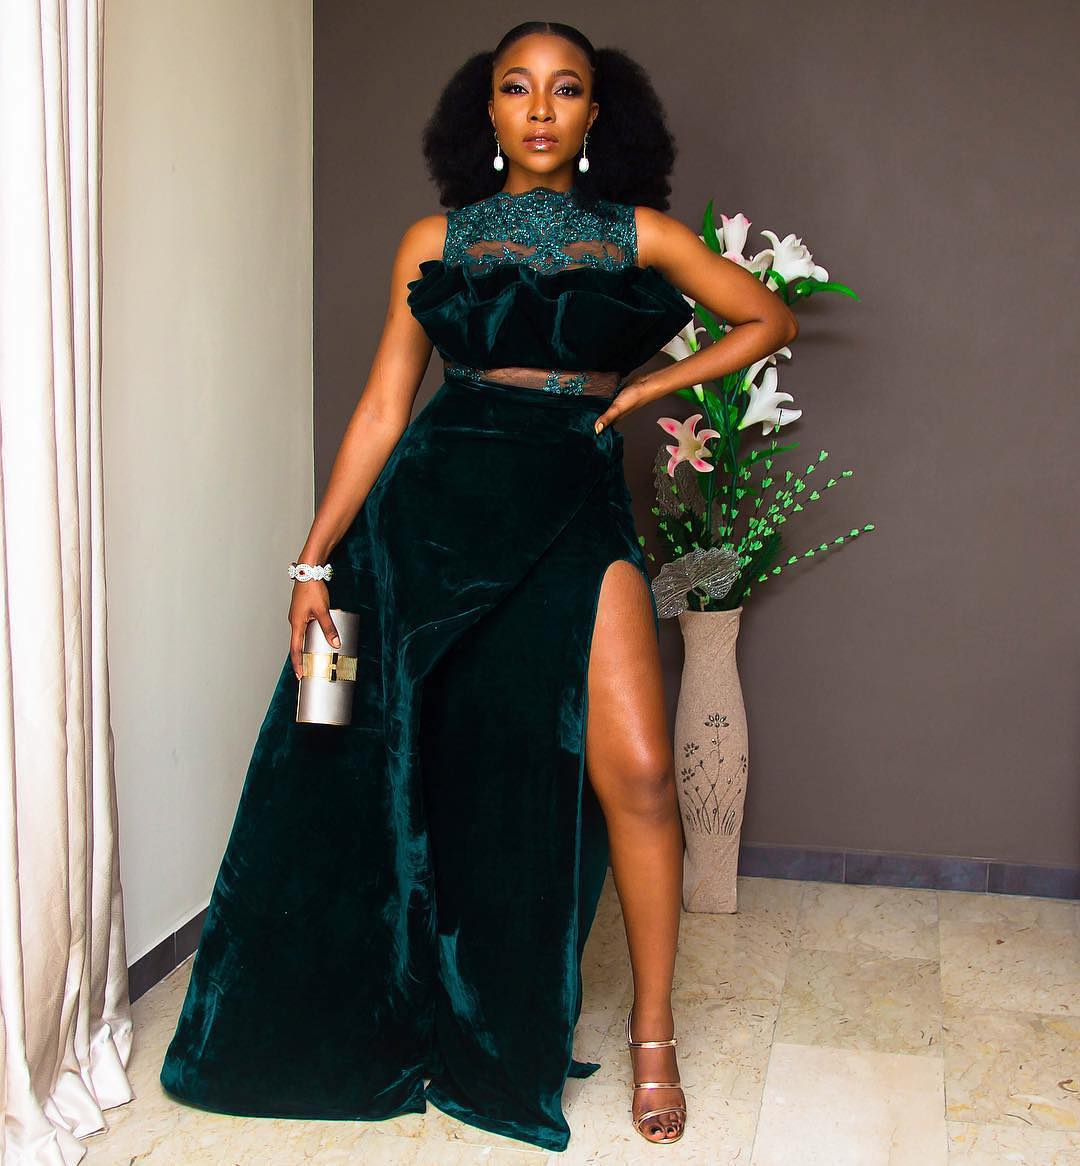 24838431_374497219678025_2428123373830668288_n Photos: Celebrities at The Future Awards Africa 2017 | #TFAA2017 Celebrities Entertainment